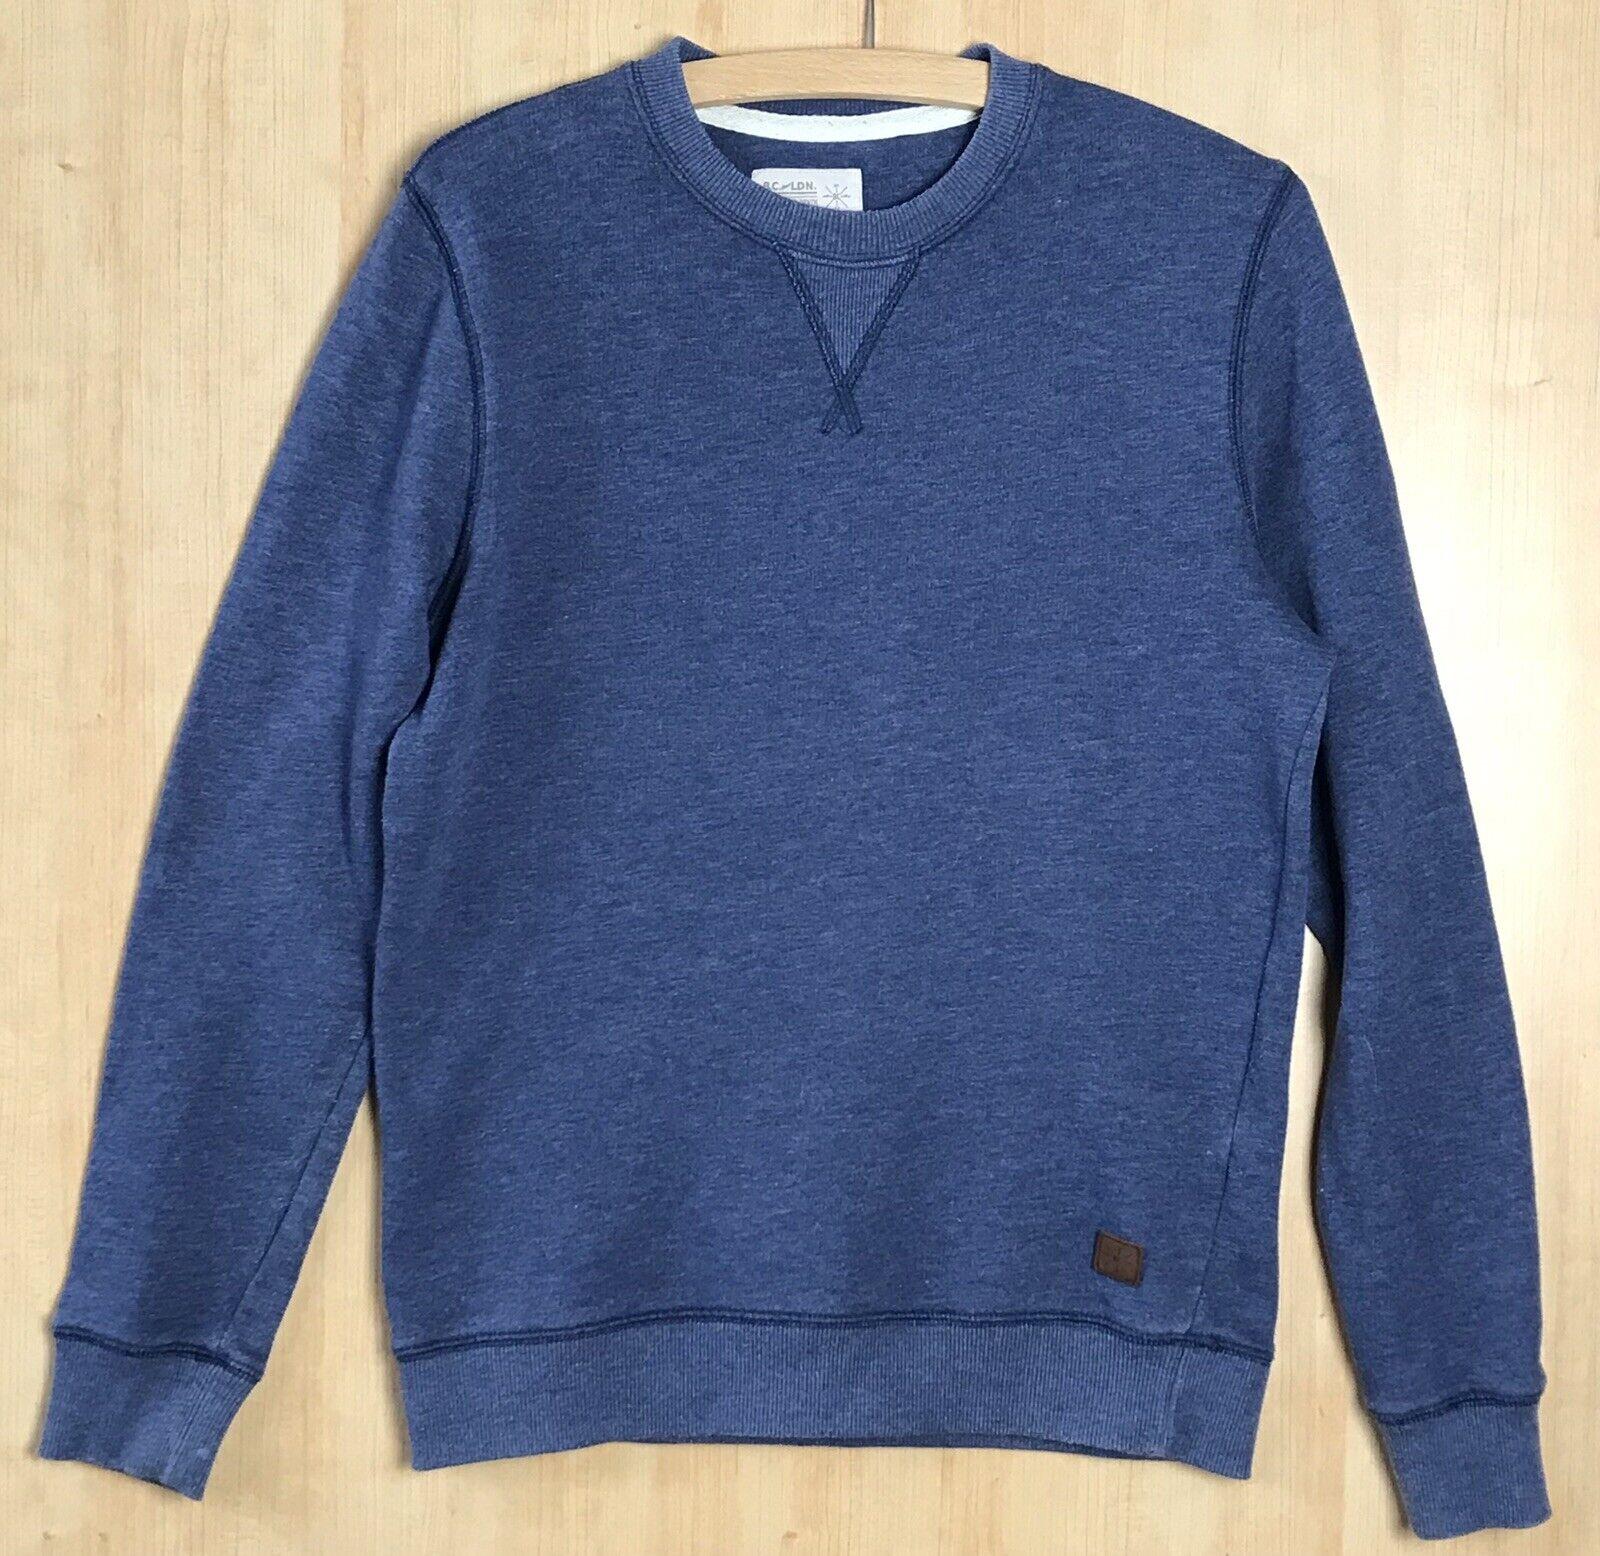 B.C. London Size Small Blue Marl Sweatshirt (Chest 52cm Across).